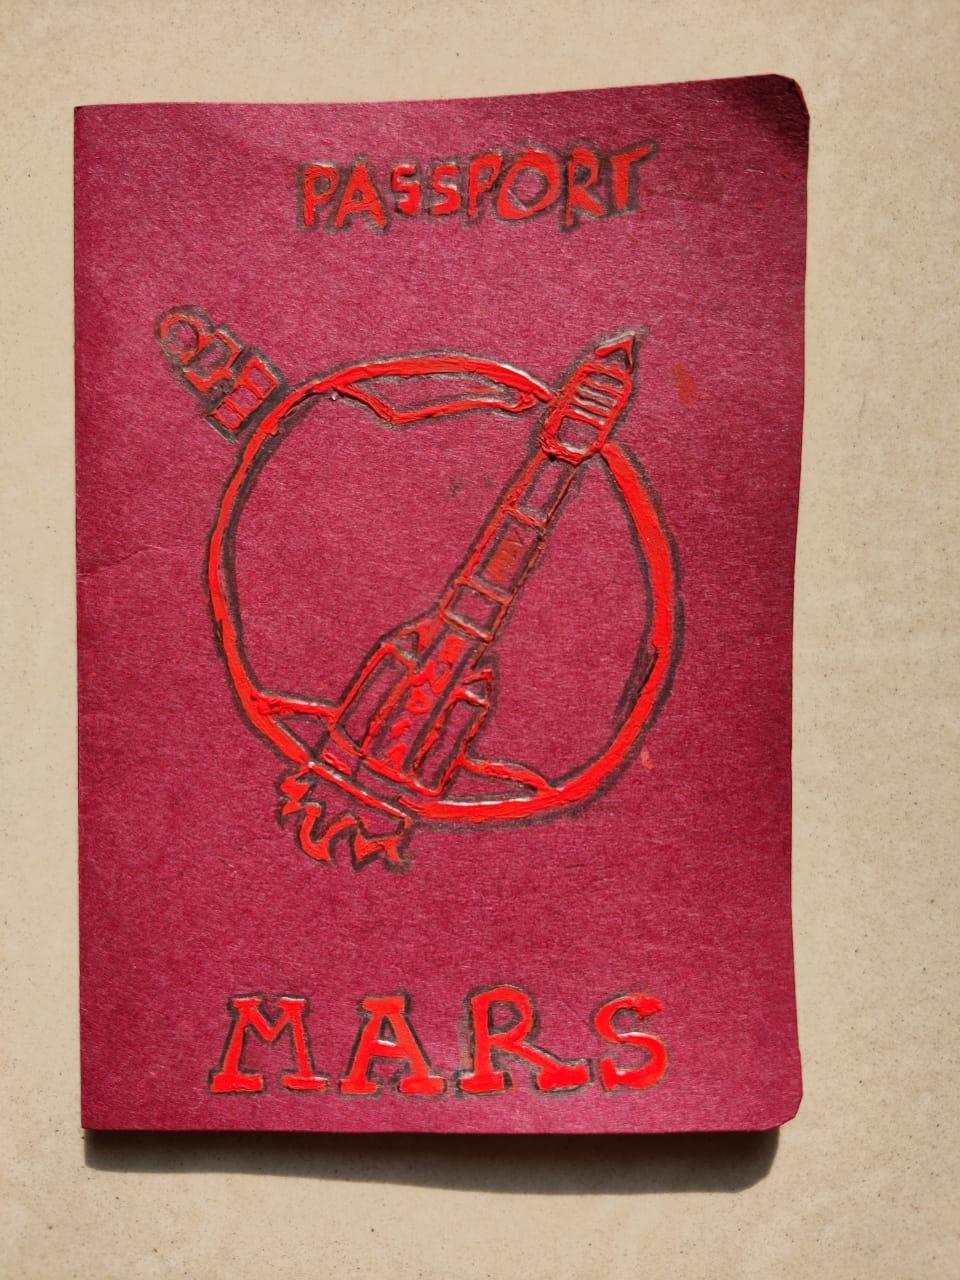 MARS PASSPORT - Naveen singh